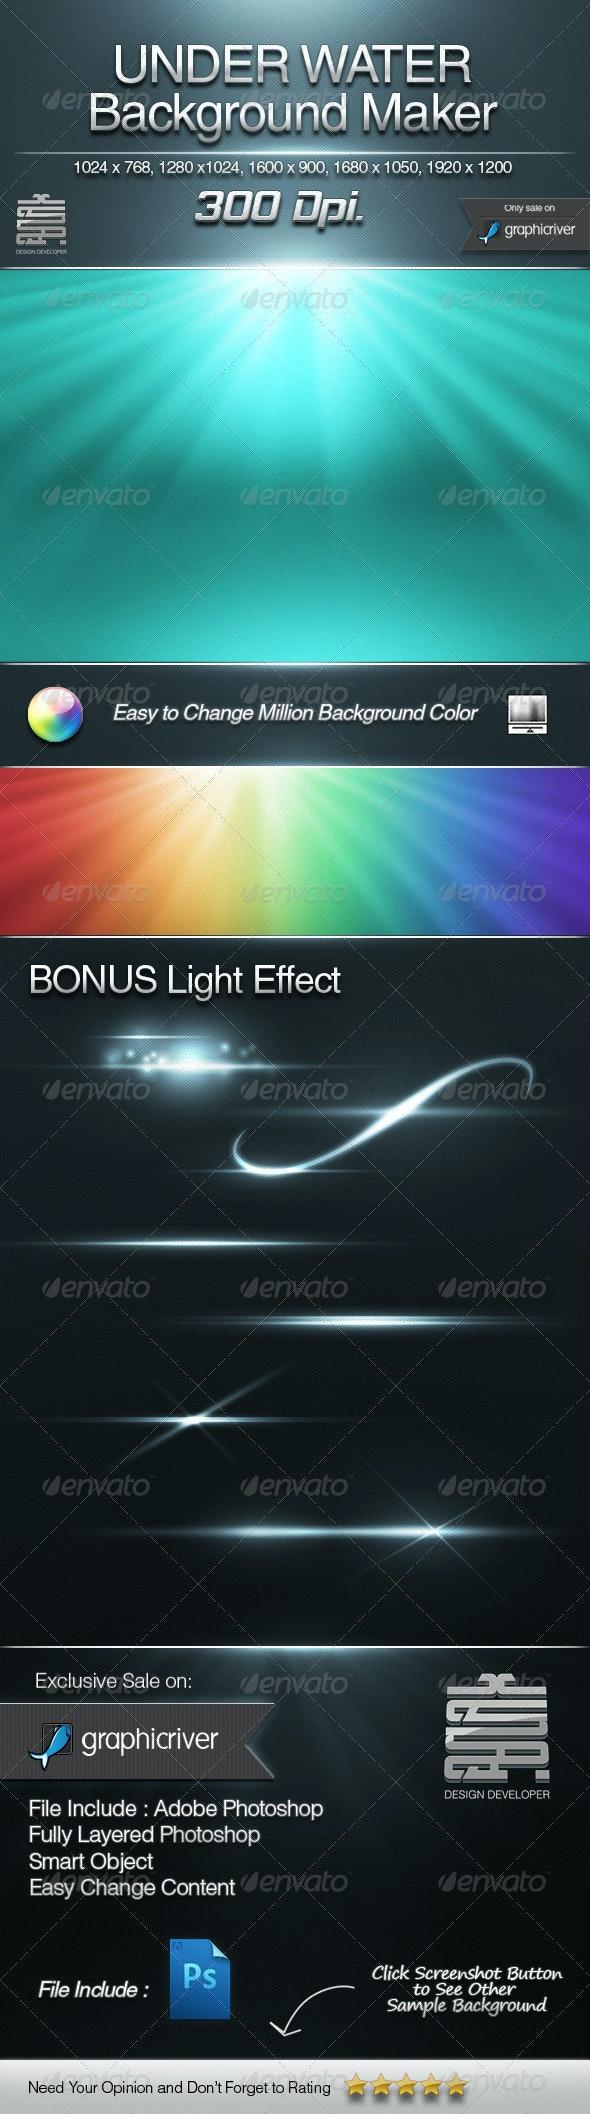 UNDER WATER Background maker & Bonus Light Effect - Backgrounds Graphics